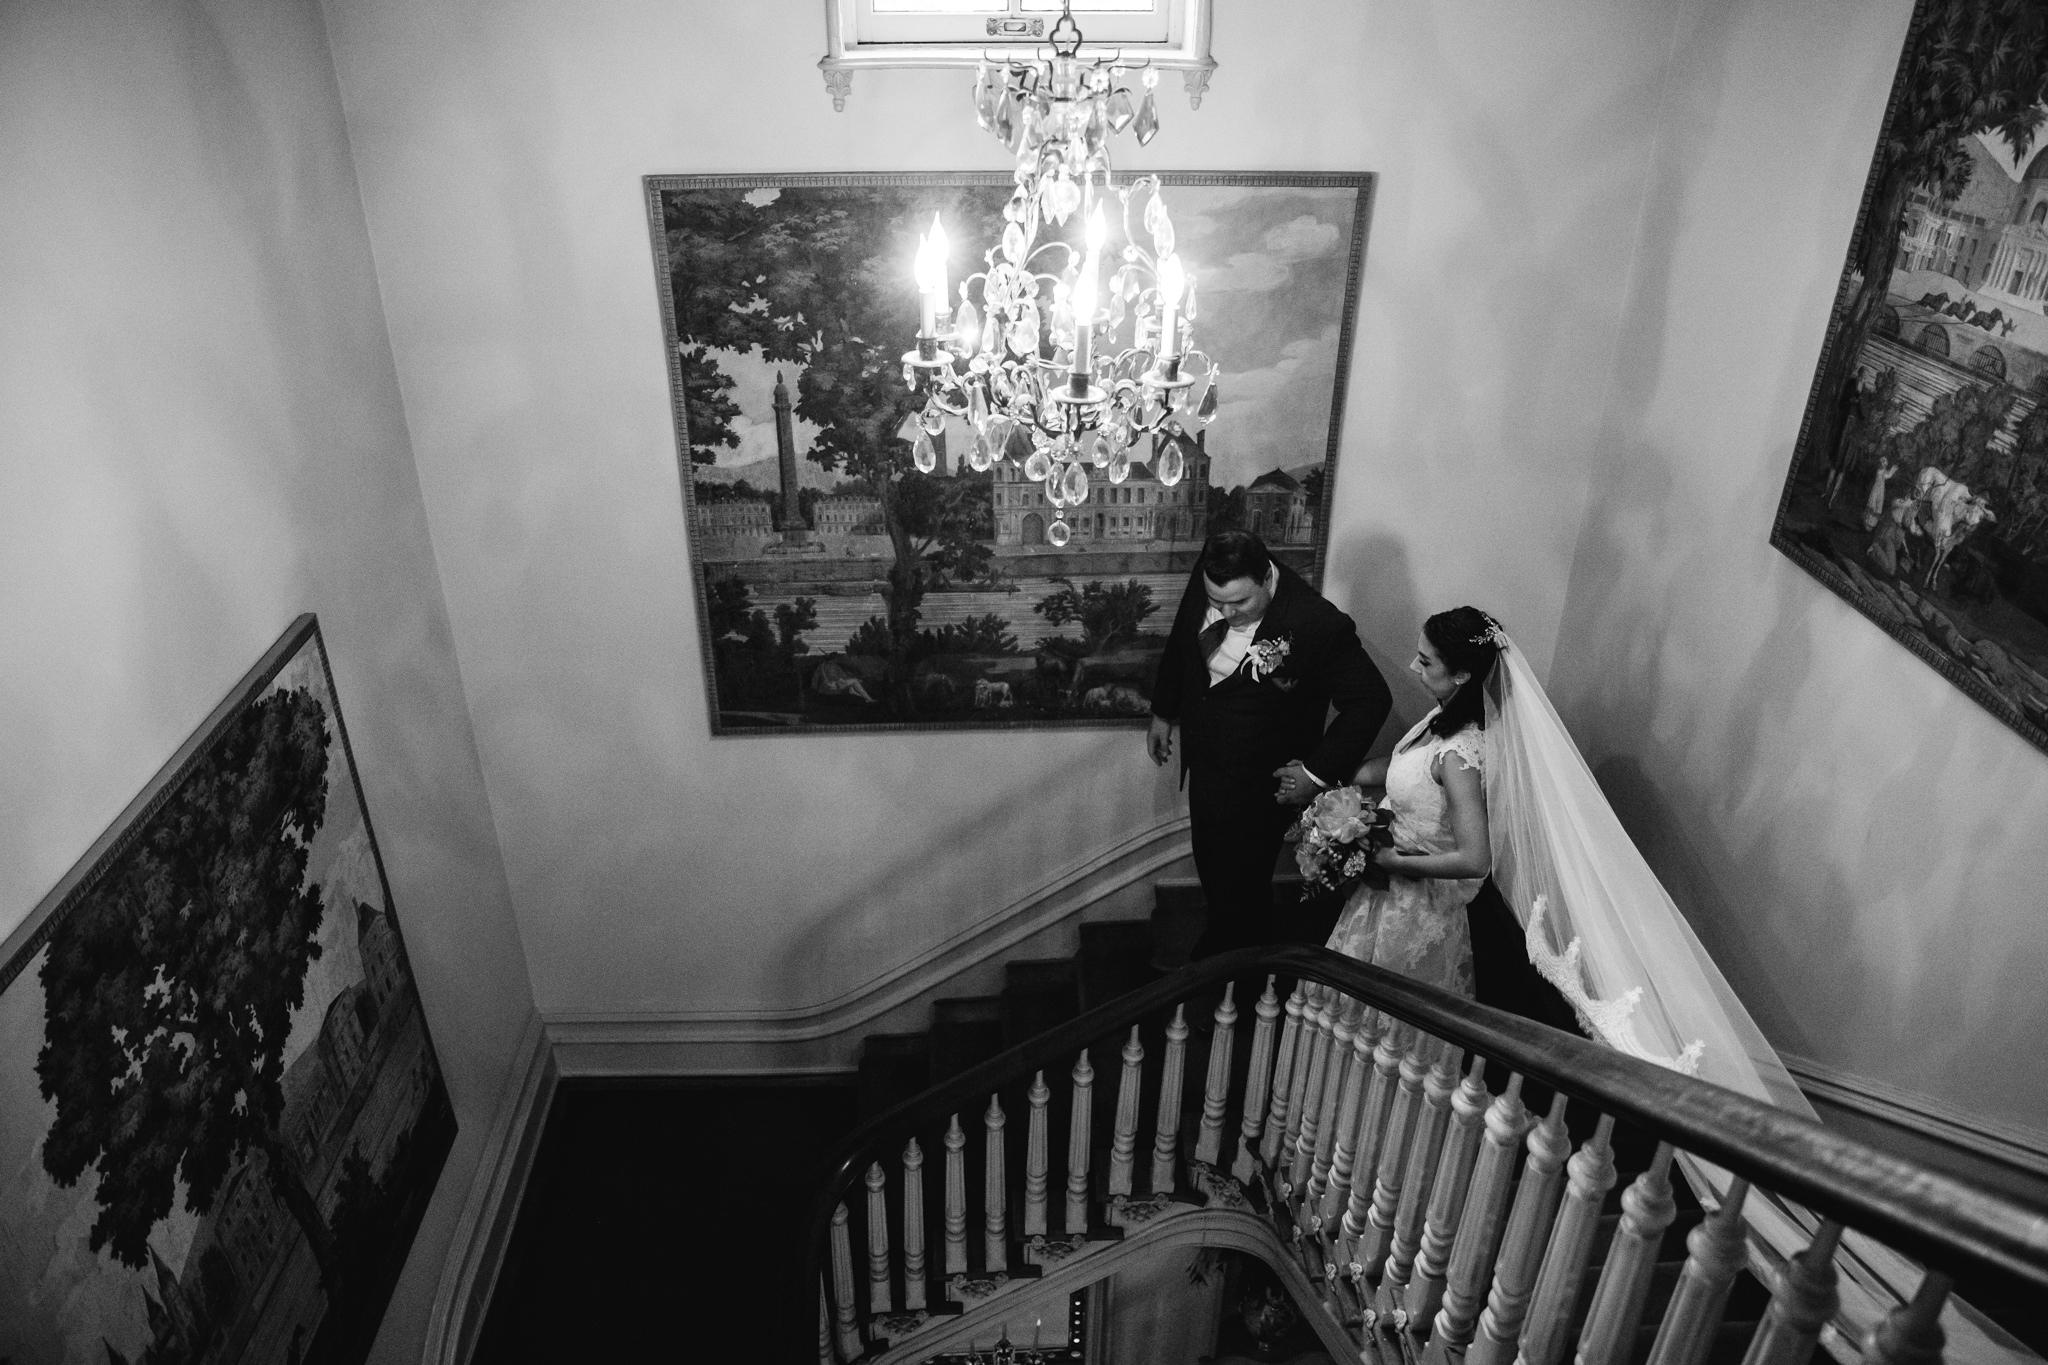 woodruff-fontaine-wedding-venue-memphis-thewarmtharoundyou-brenda-taylor-17.jpg